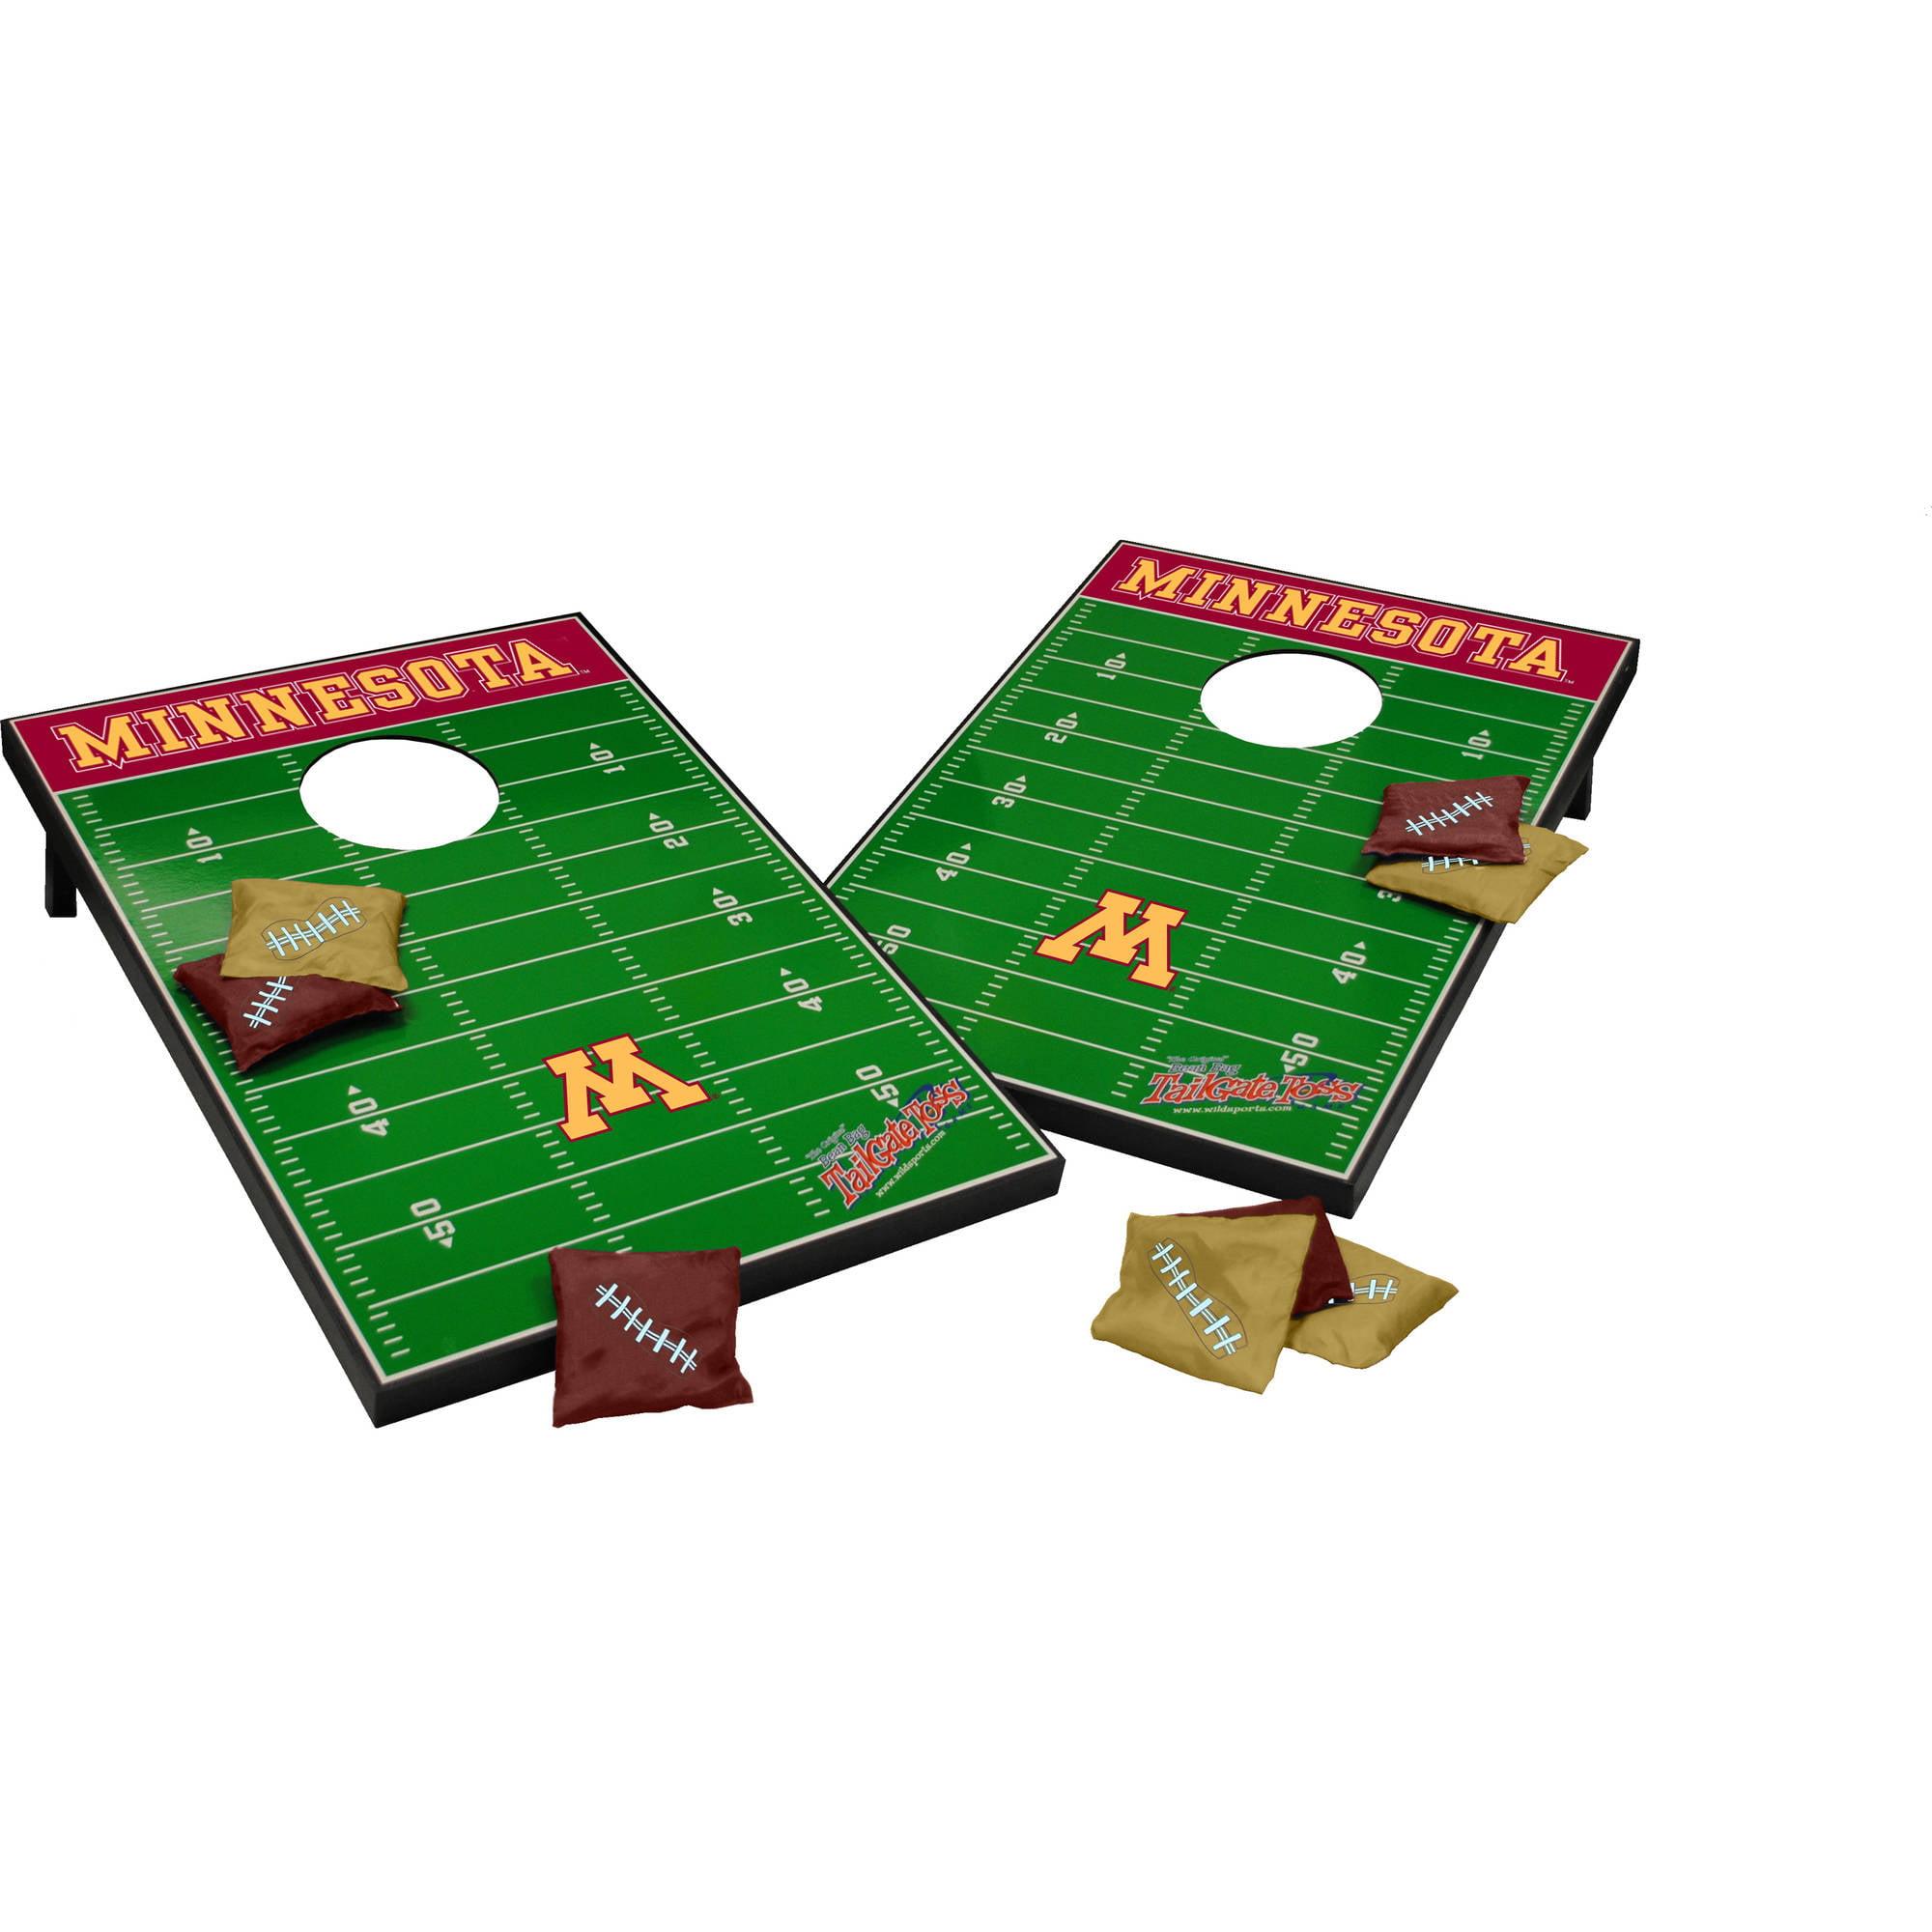 Wild Sports Collegiate Minnesota Golden Gophers 2x3 Field Tailgate Toss by Wild Sports